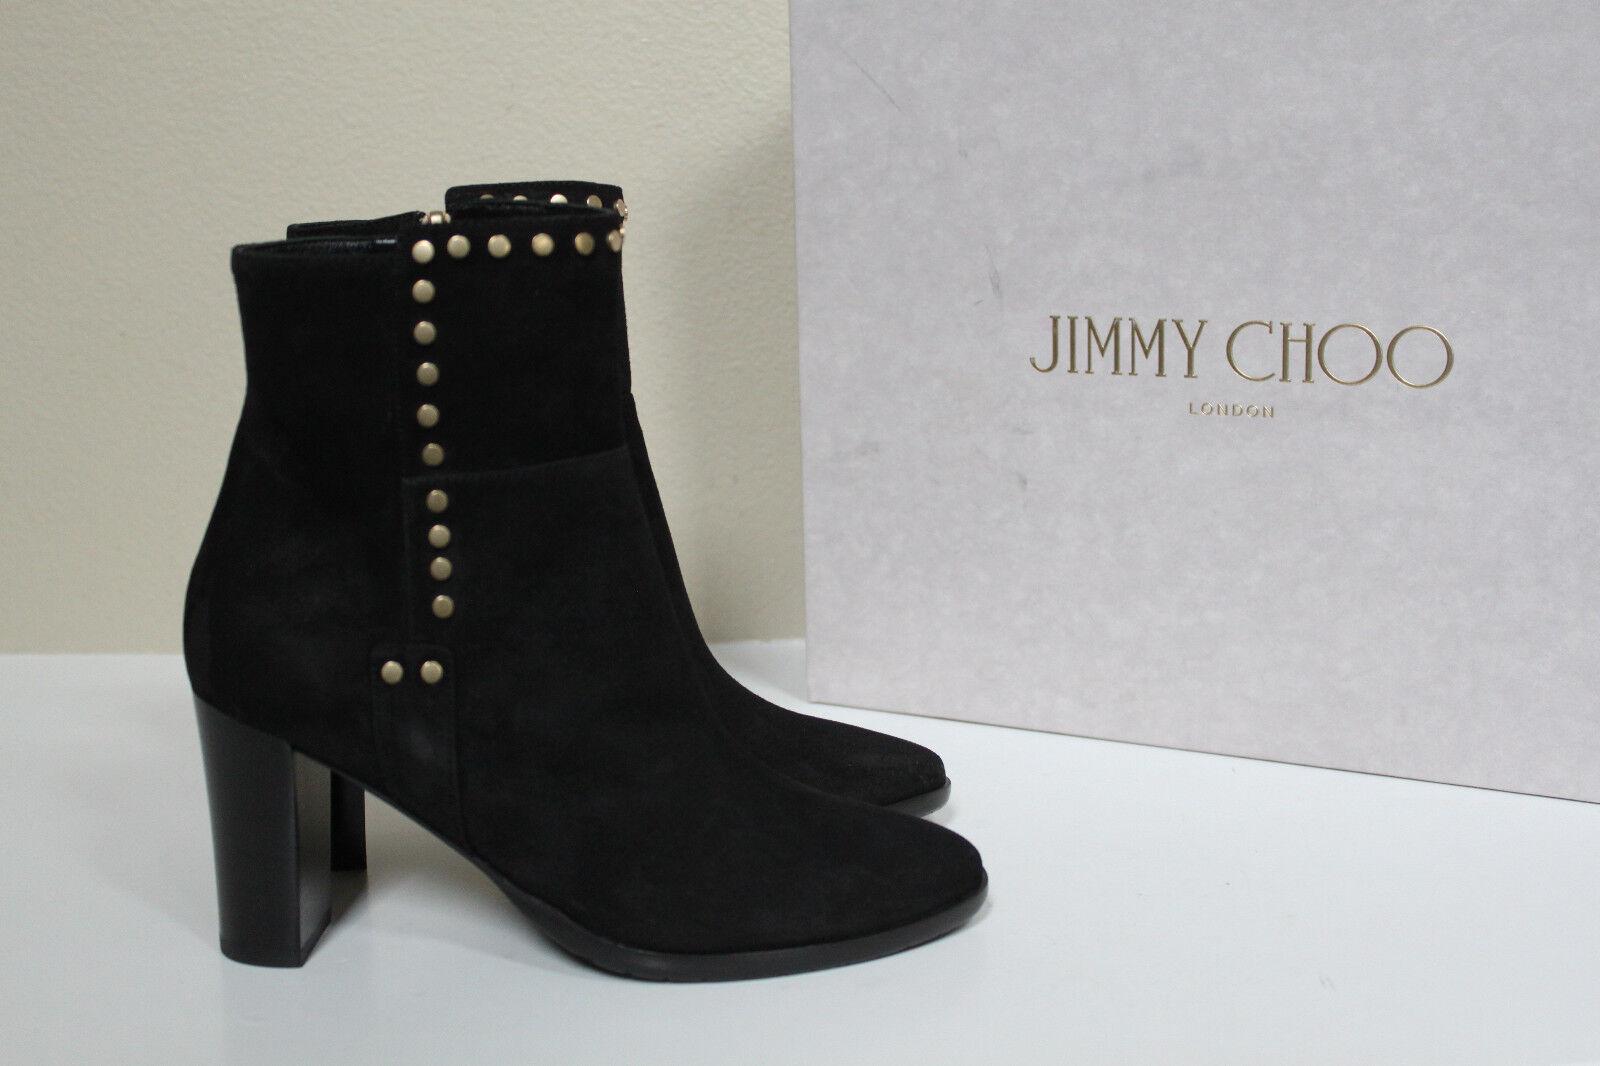 100% nuovo di zecca con qualità originale New sz 6   36 Jimmy Choo nero Suede Suede Suede Harlow Studded Ankle avvioie Block Heel Shoe  fabbrica diretta